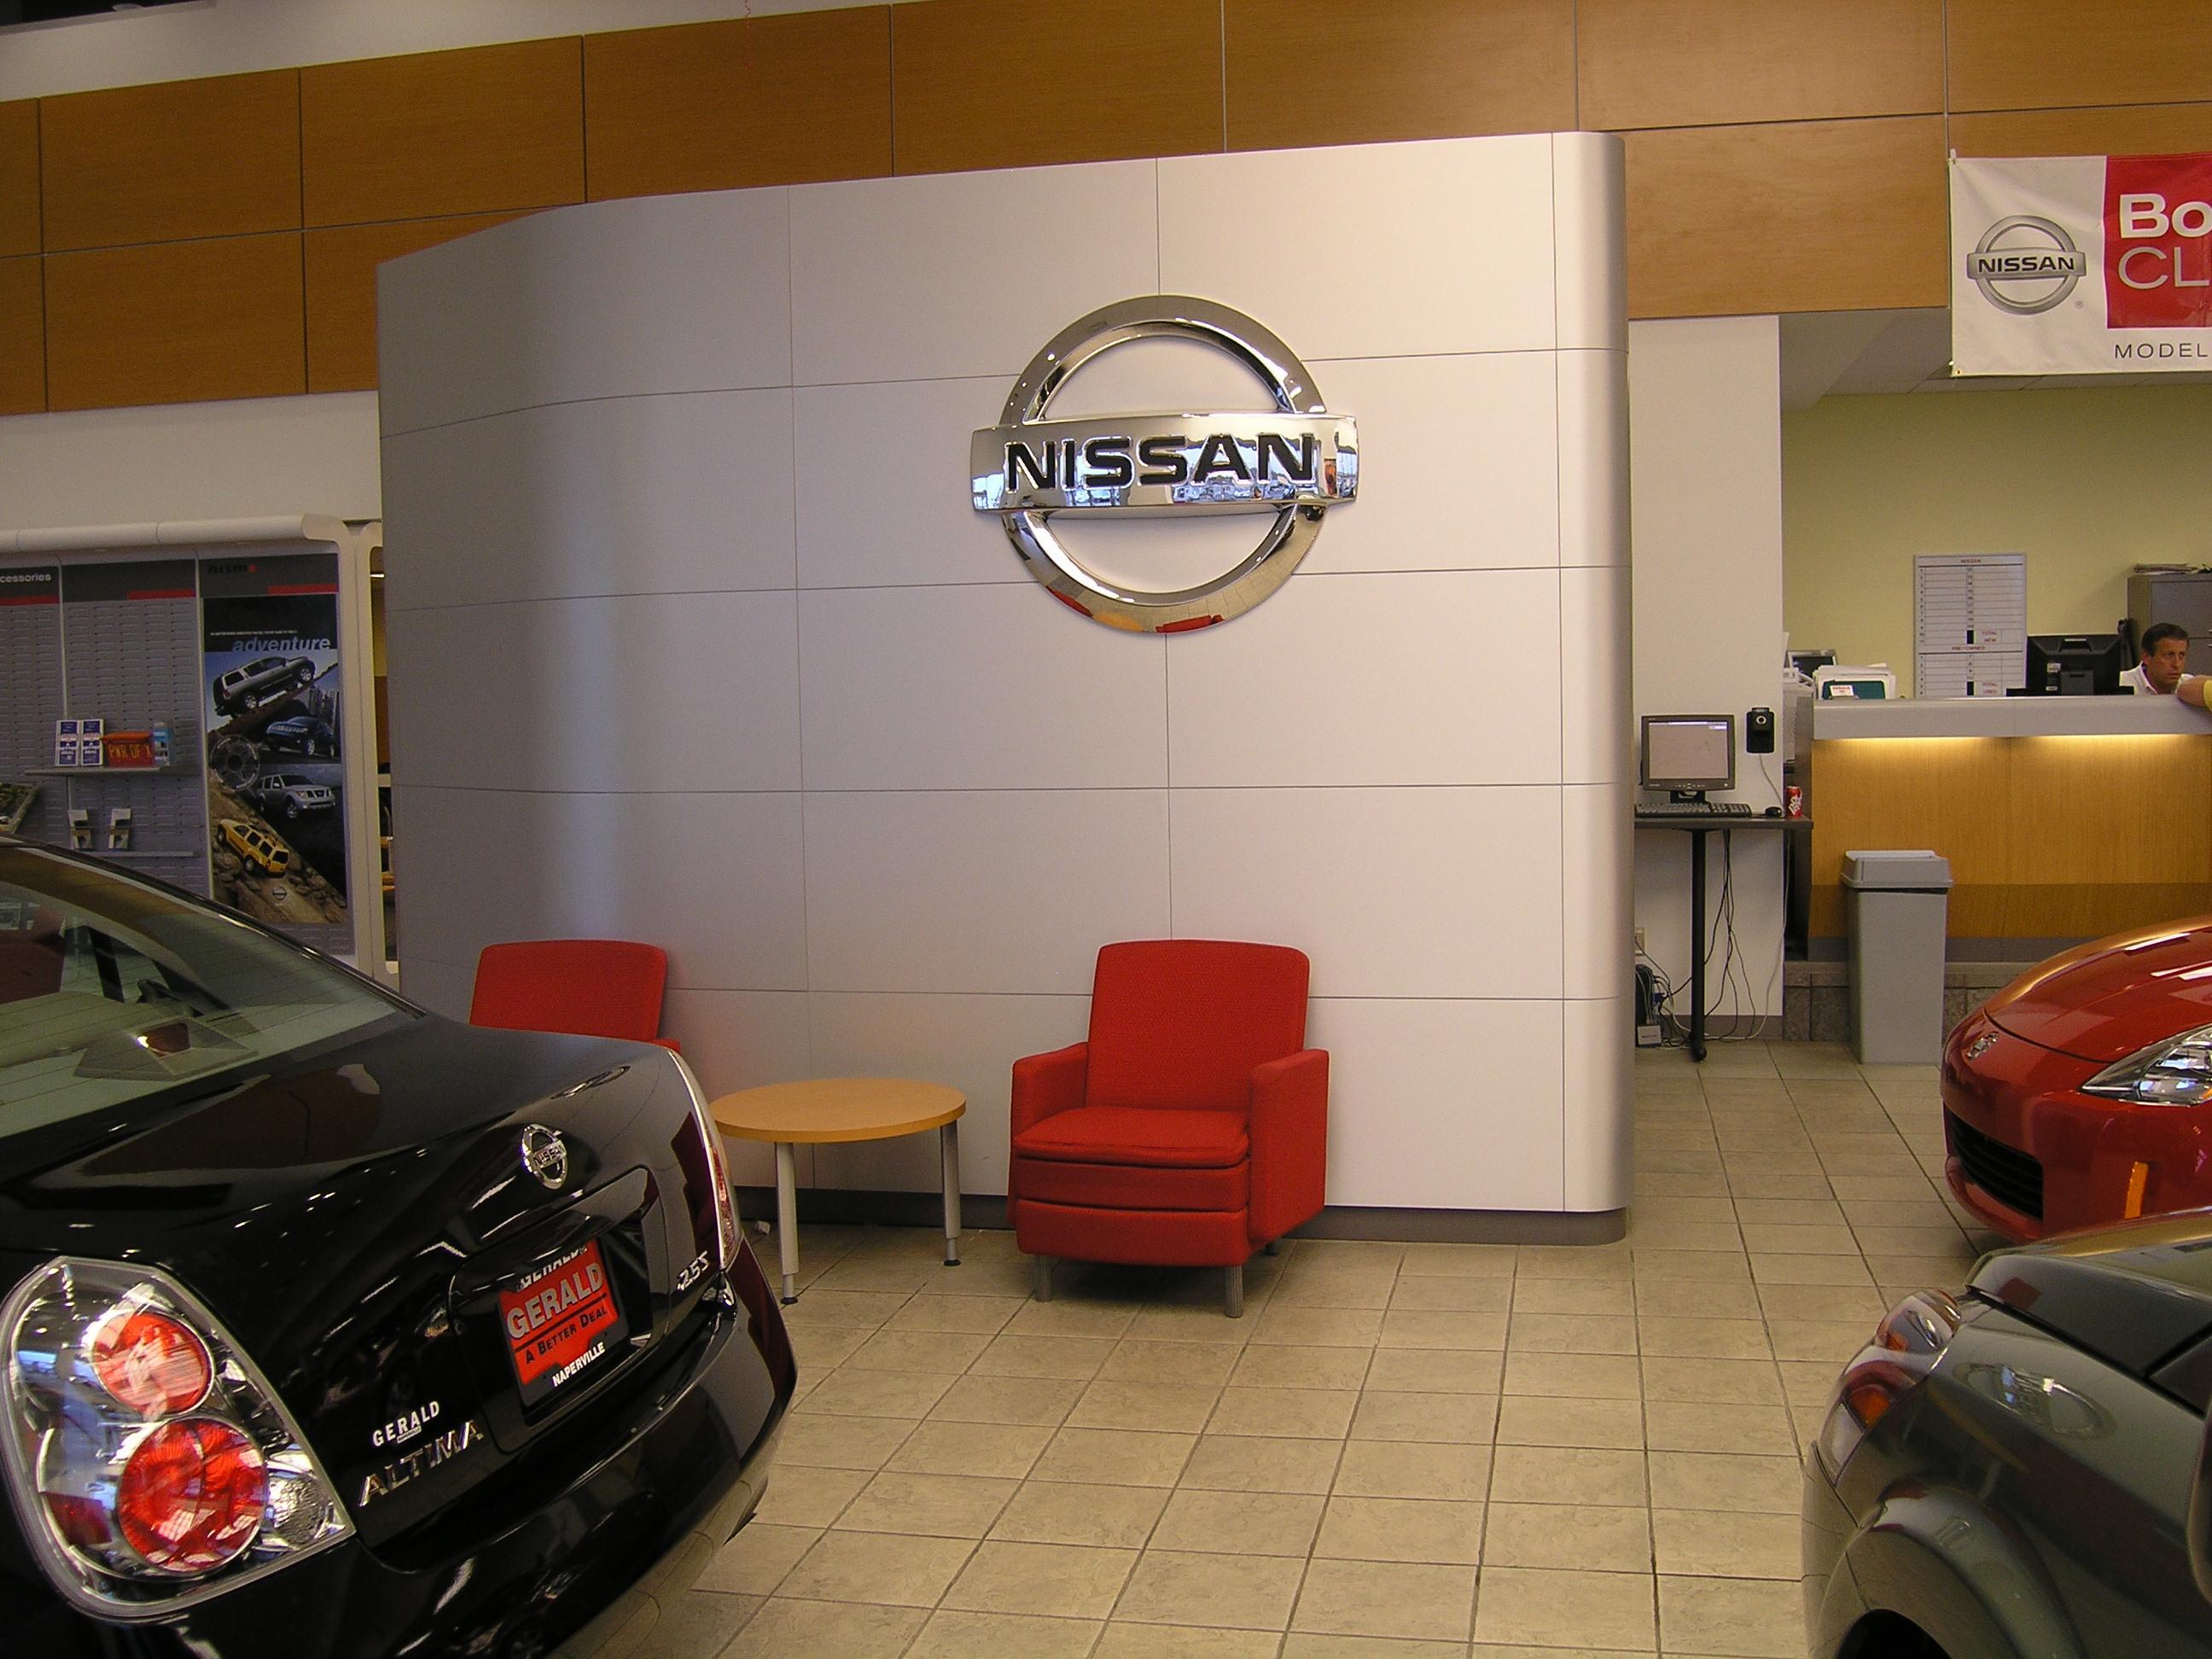 Gerald Nissan Display